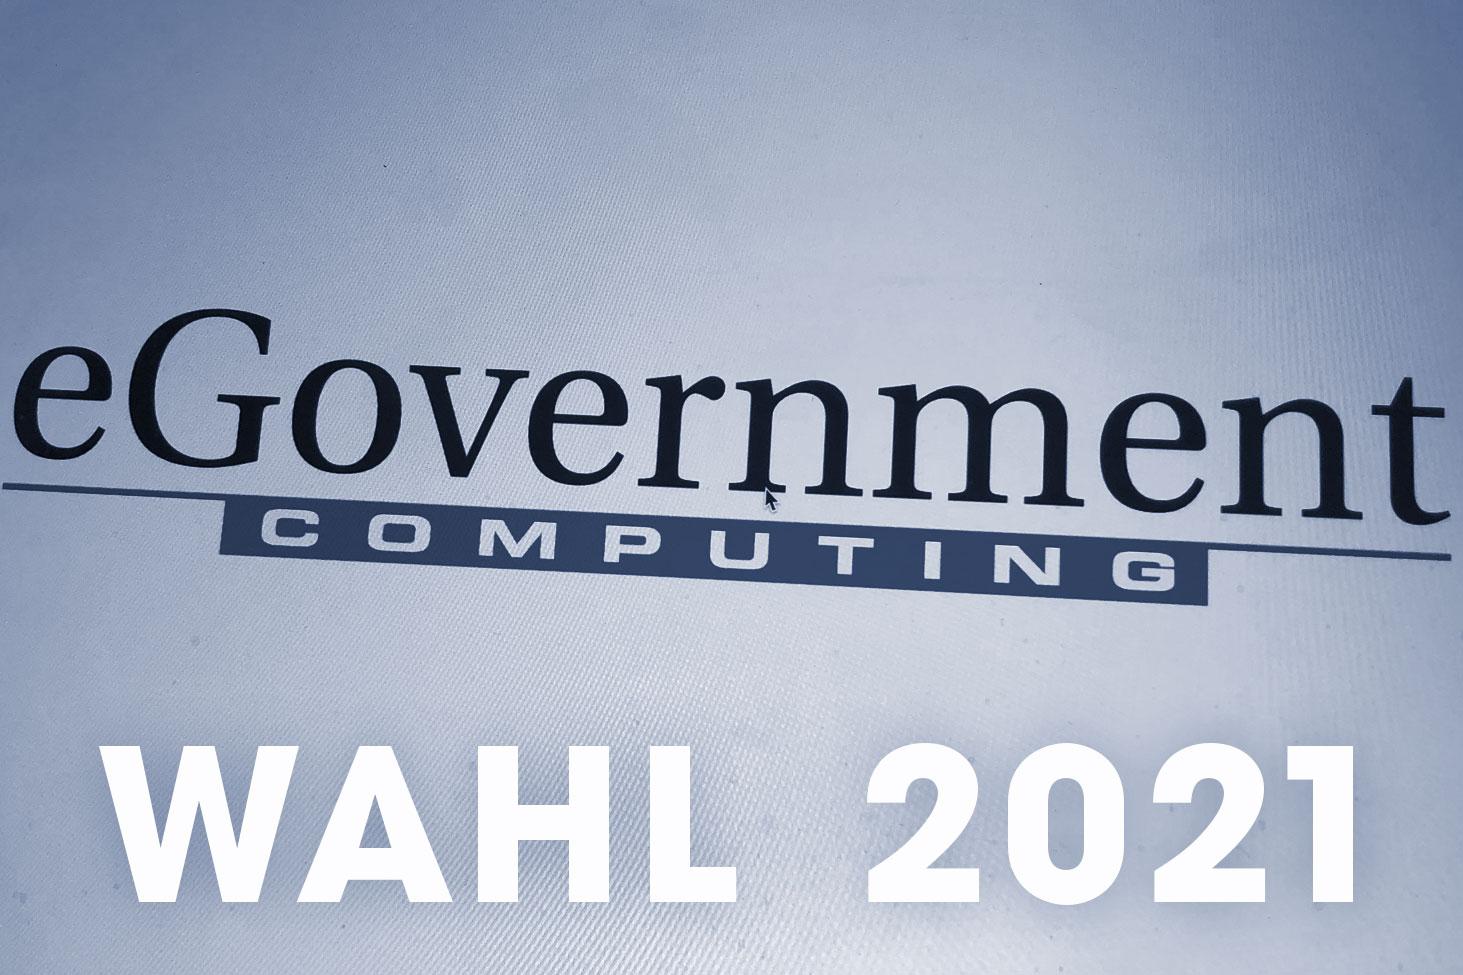 eGovermet-Computing-Award